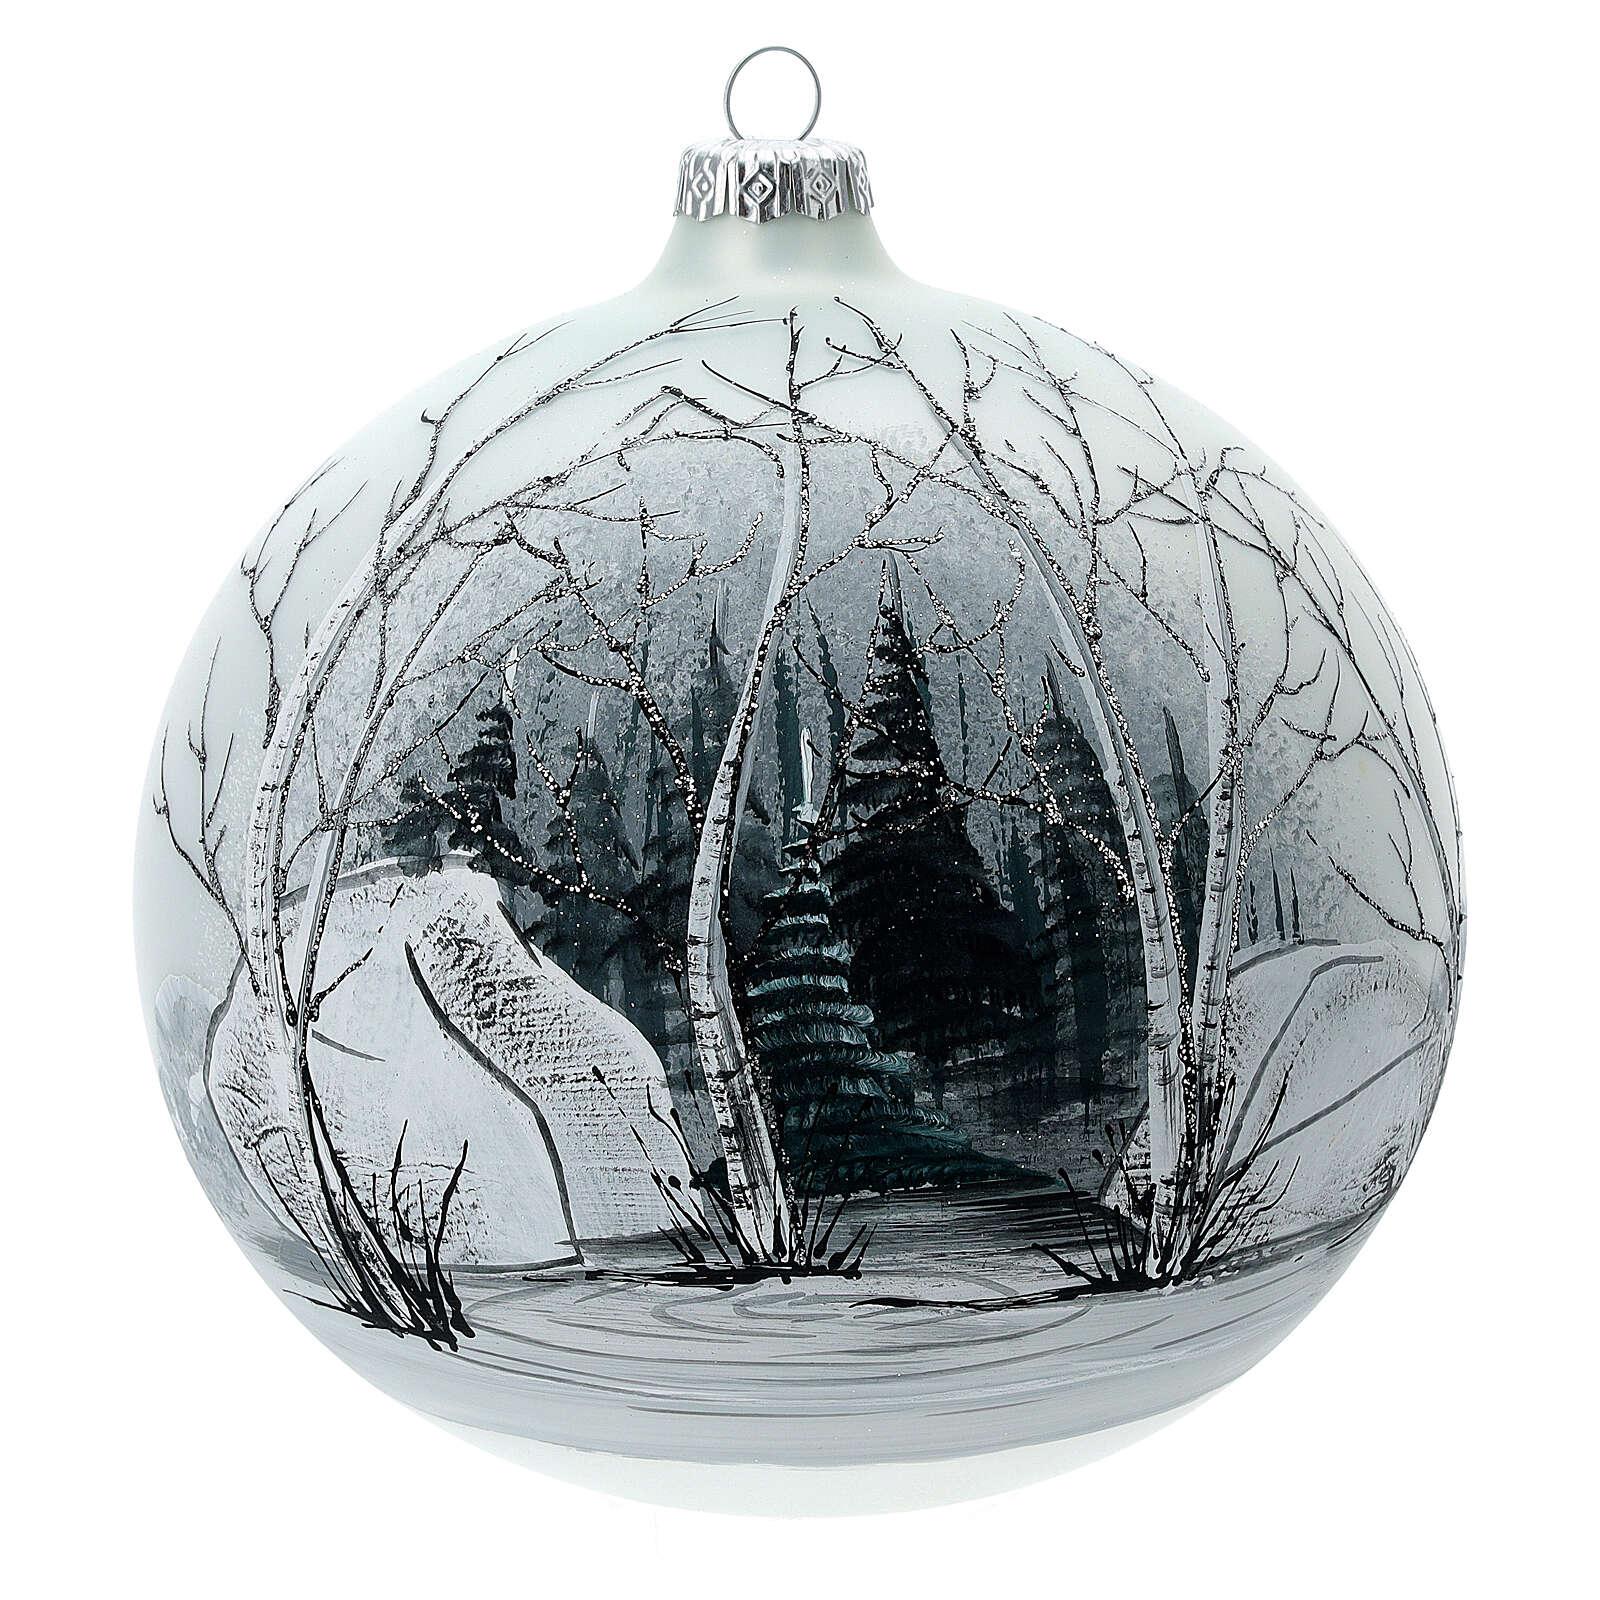 Pallina albero natale bosco bianco nero vetro soffiato 150 mm 4